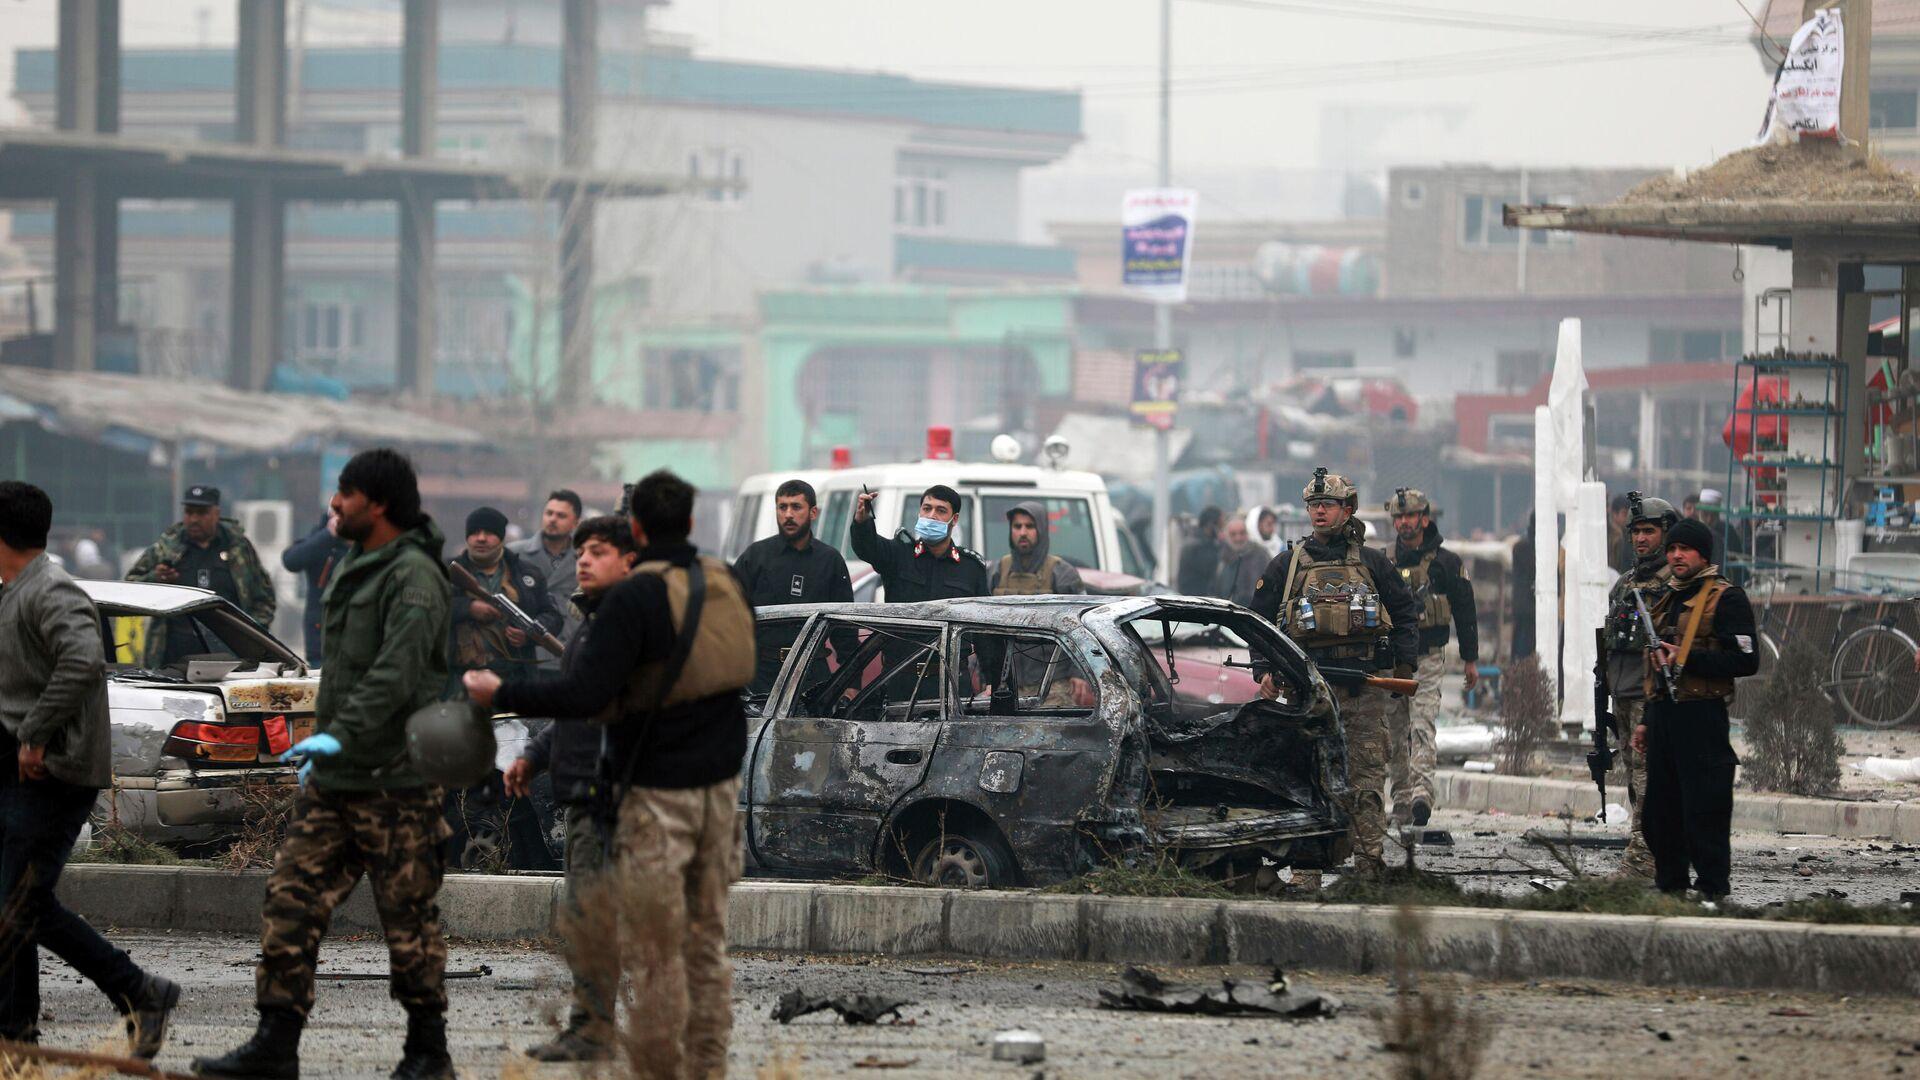 Autobombenangriff in Kabul - SNA, 1920, 11.08.2021